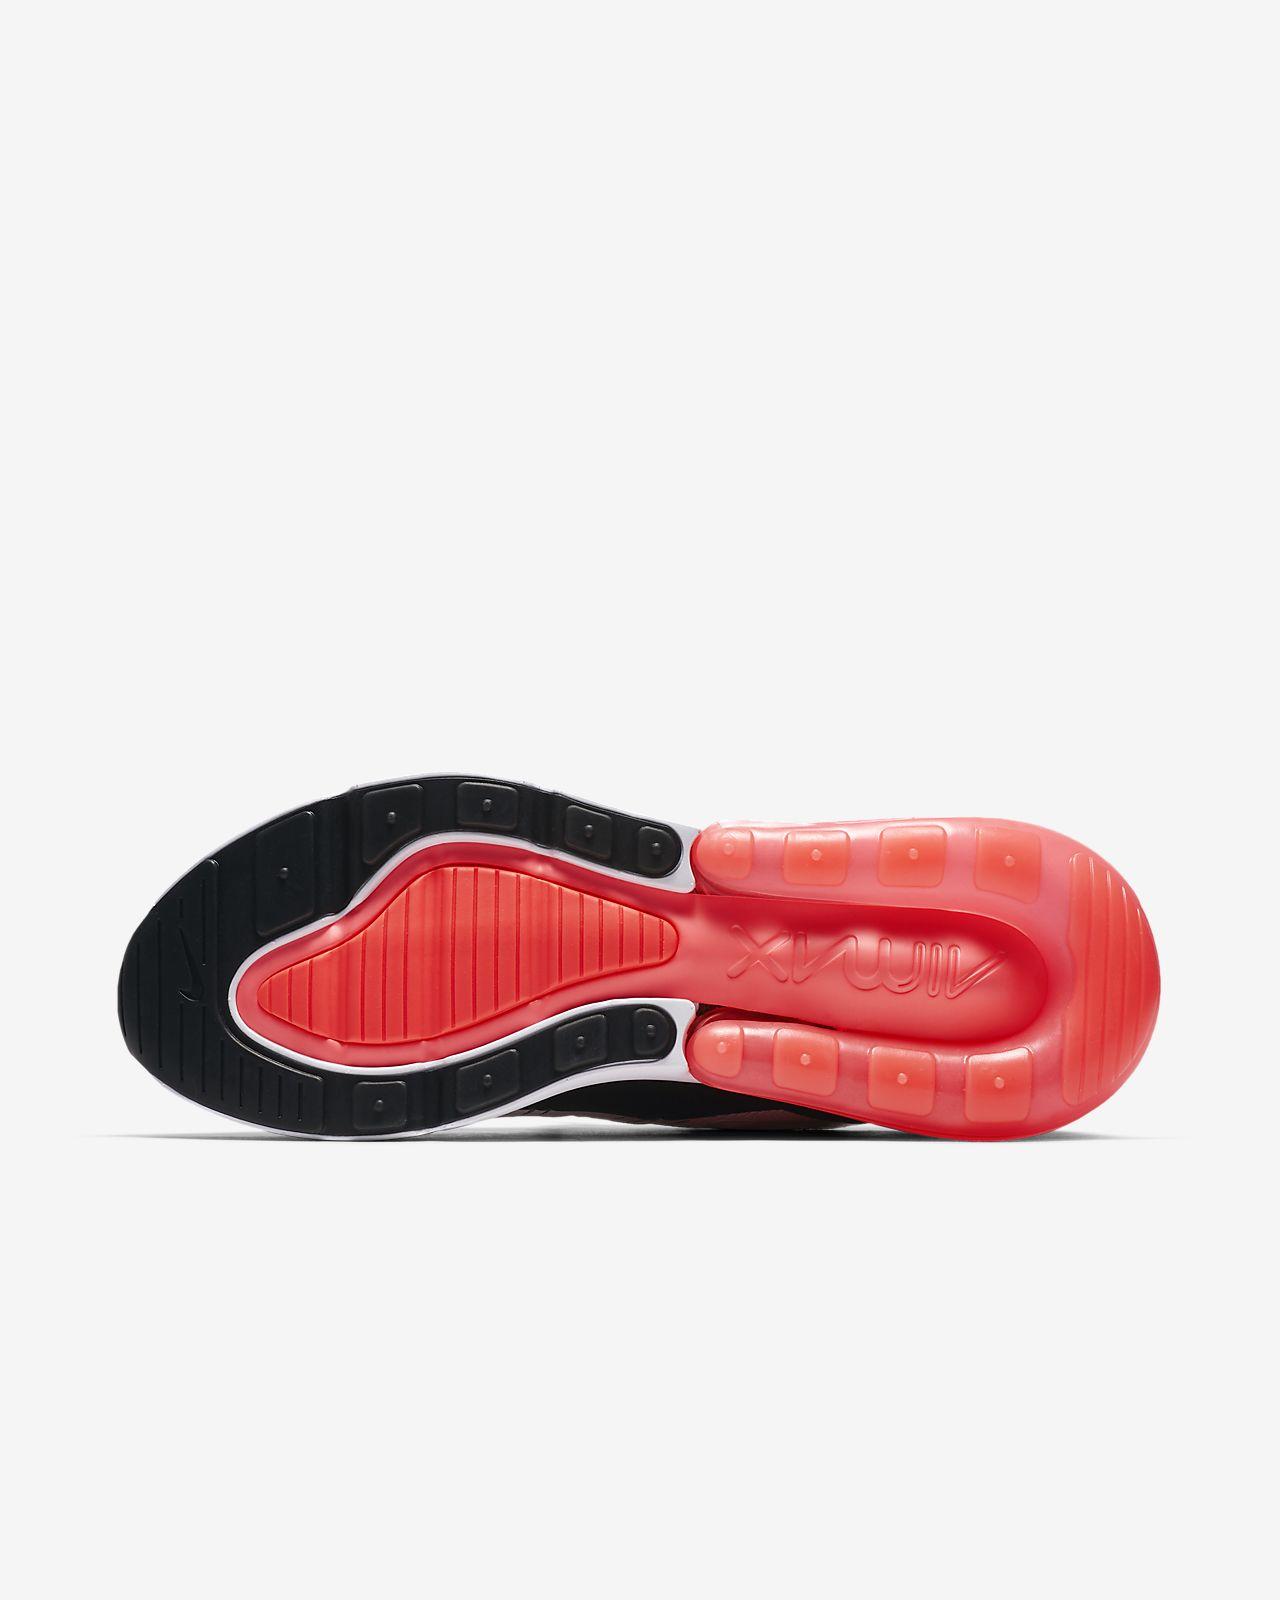 Damen Nike Air Max LD Zero SE Schuhe Grau silber angeboat